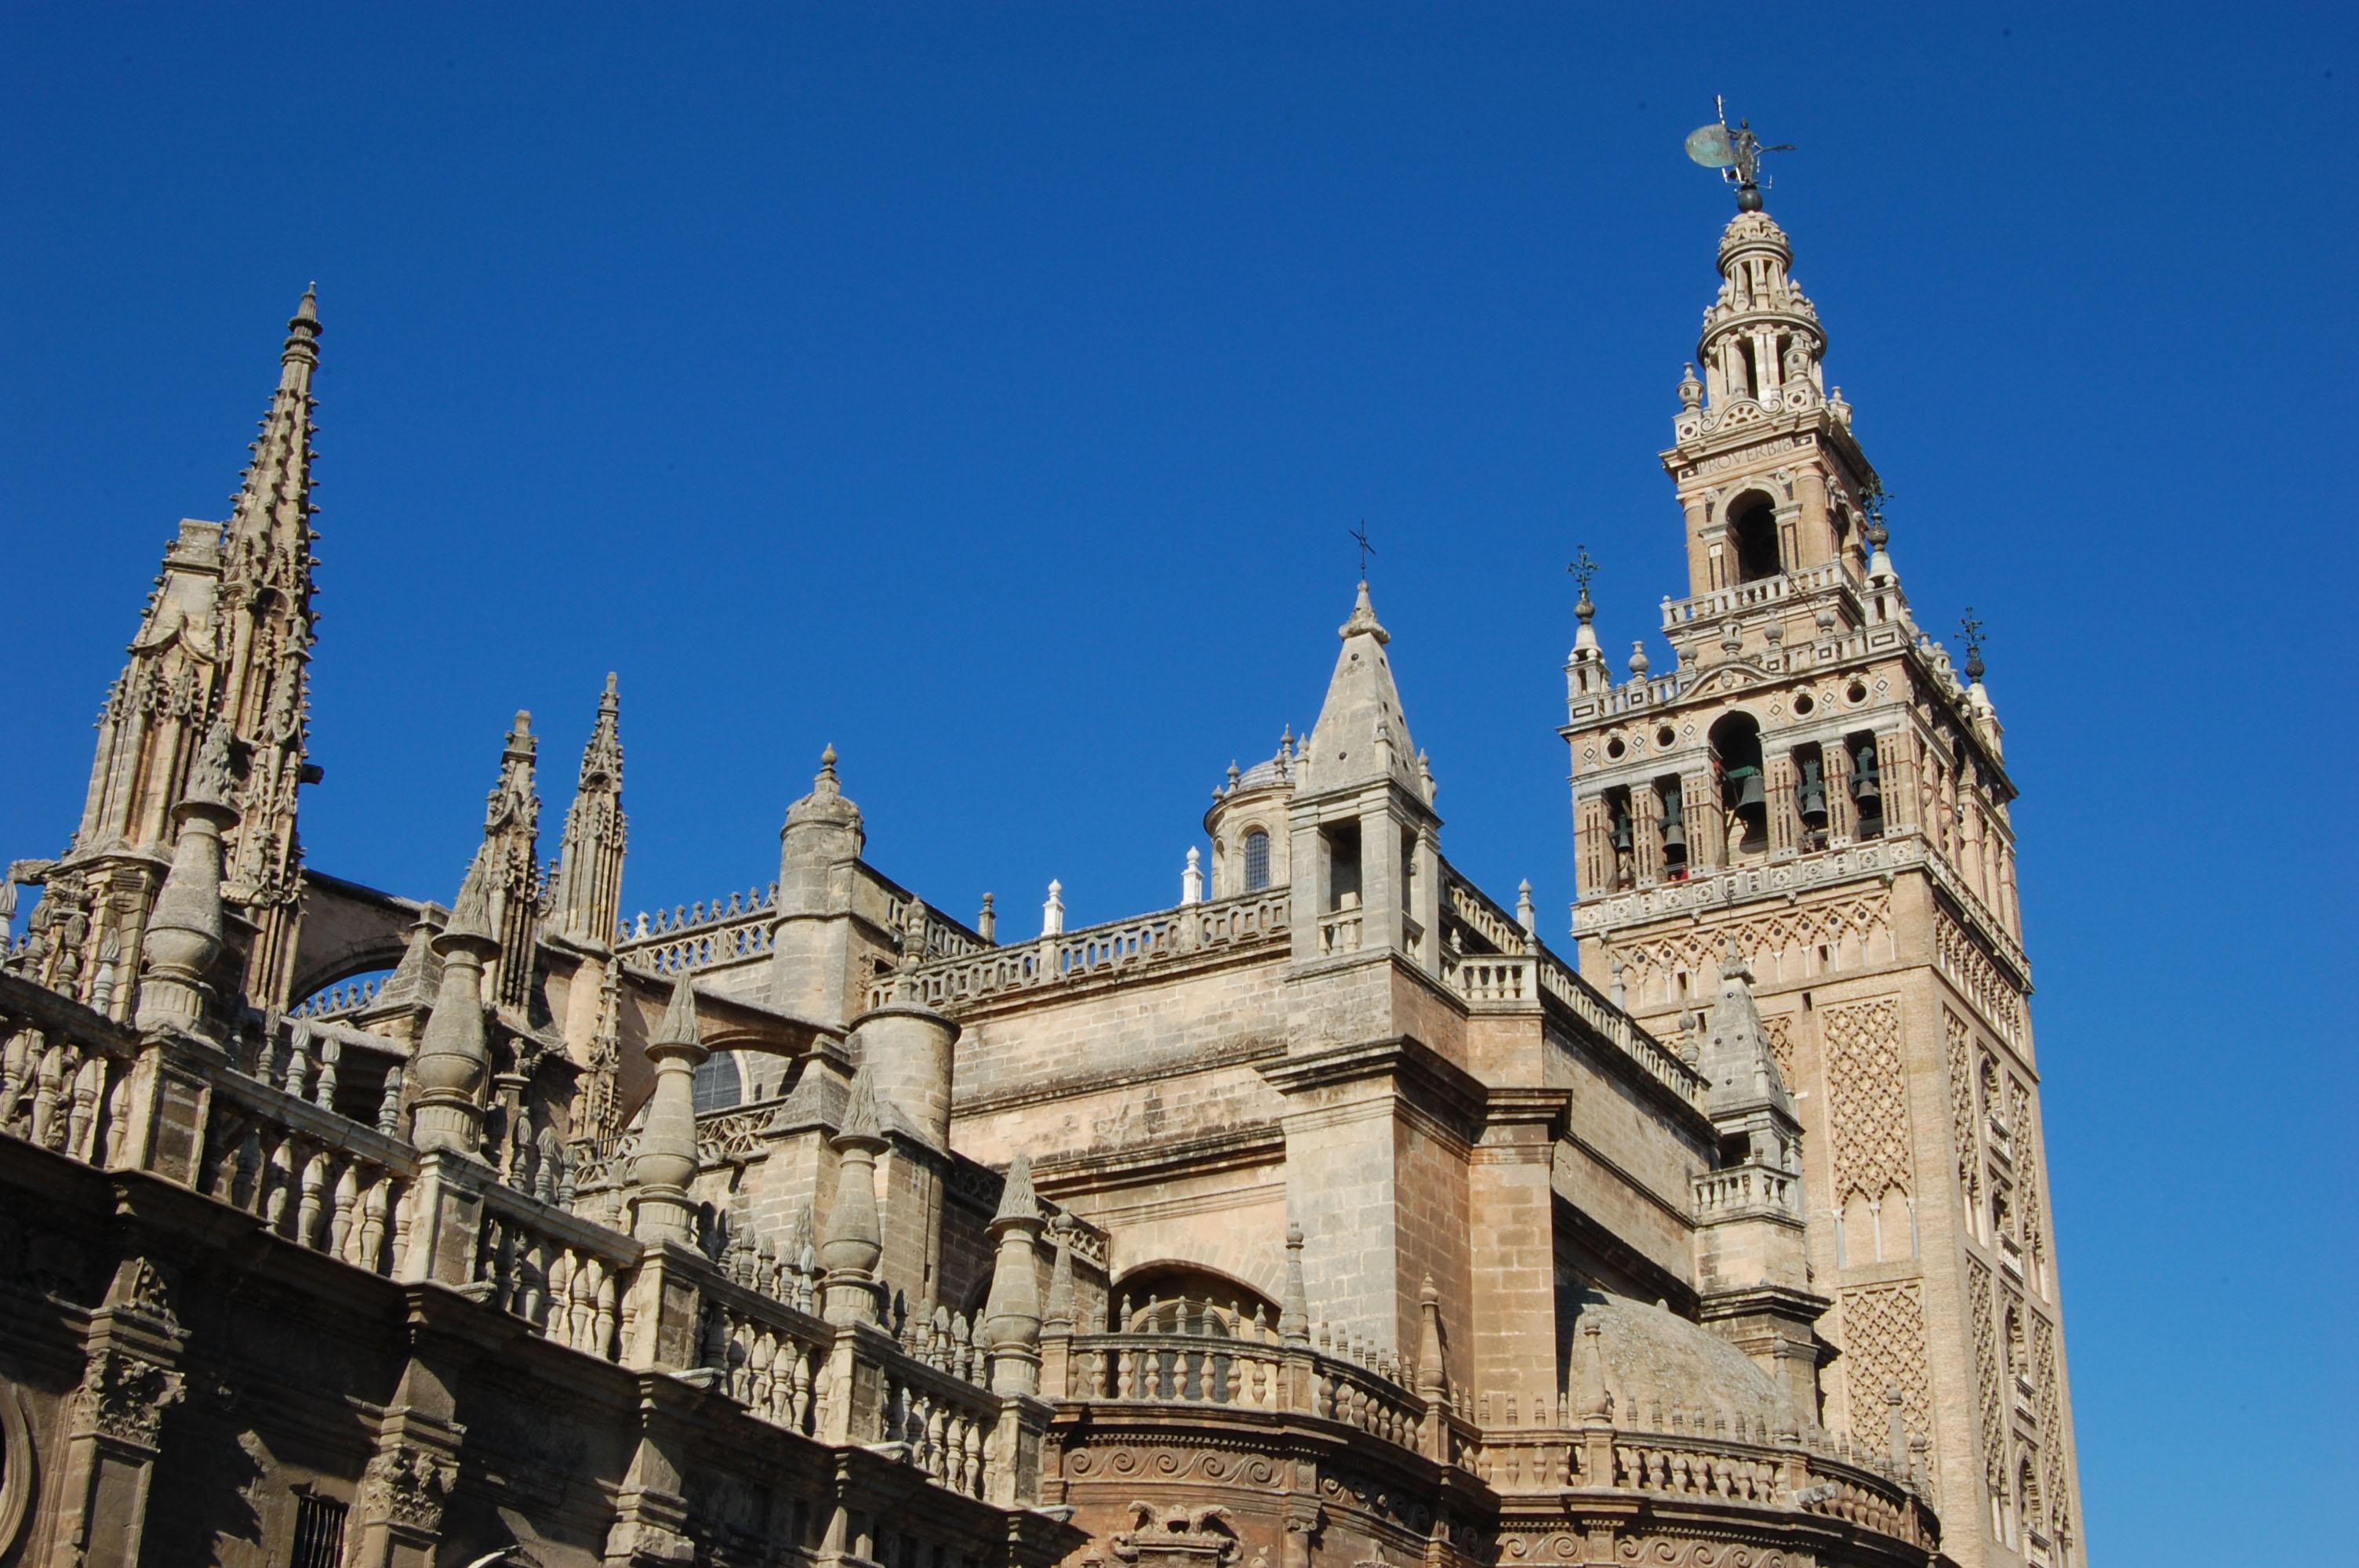 Catedral de Sevilla - Wikipedia, la enciclopedia libre